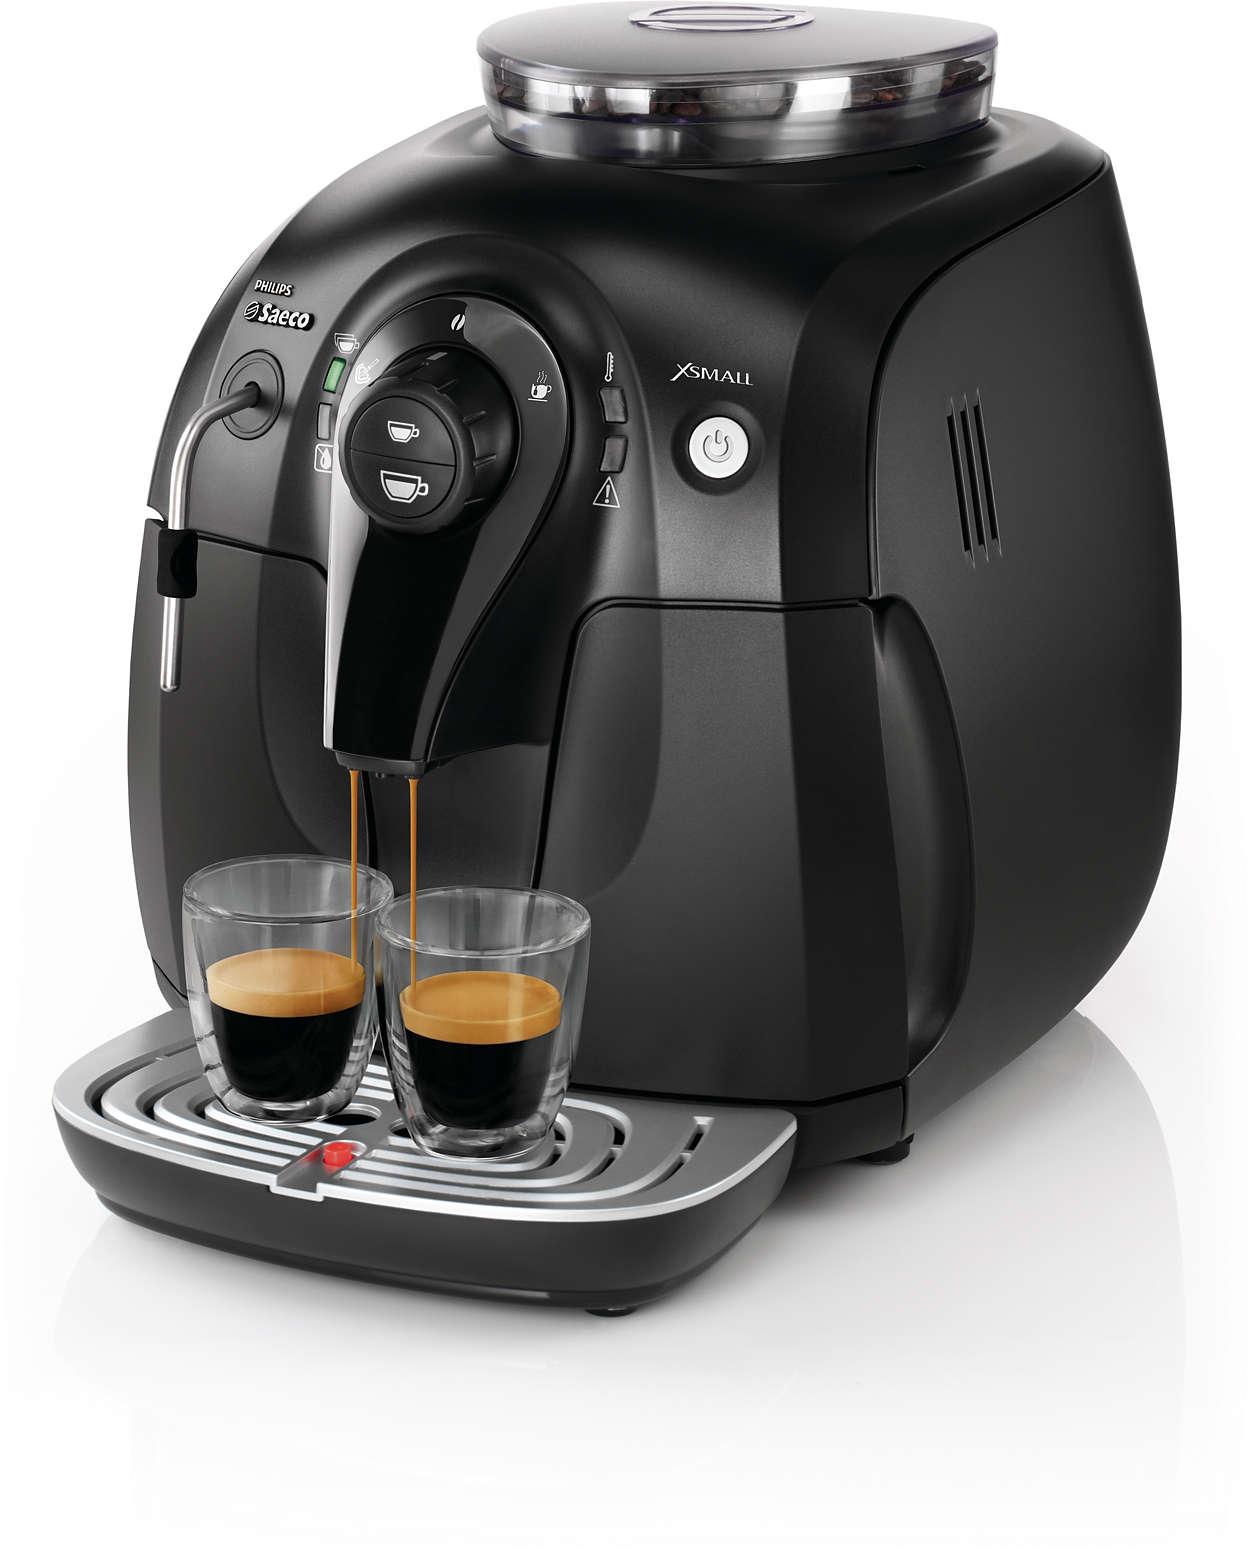 Xsmall Kaffeevollautomat Hd8743 31 Saeco